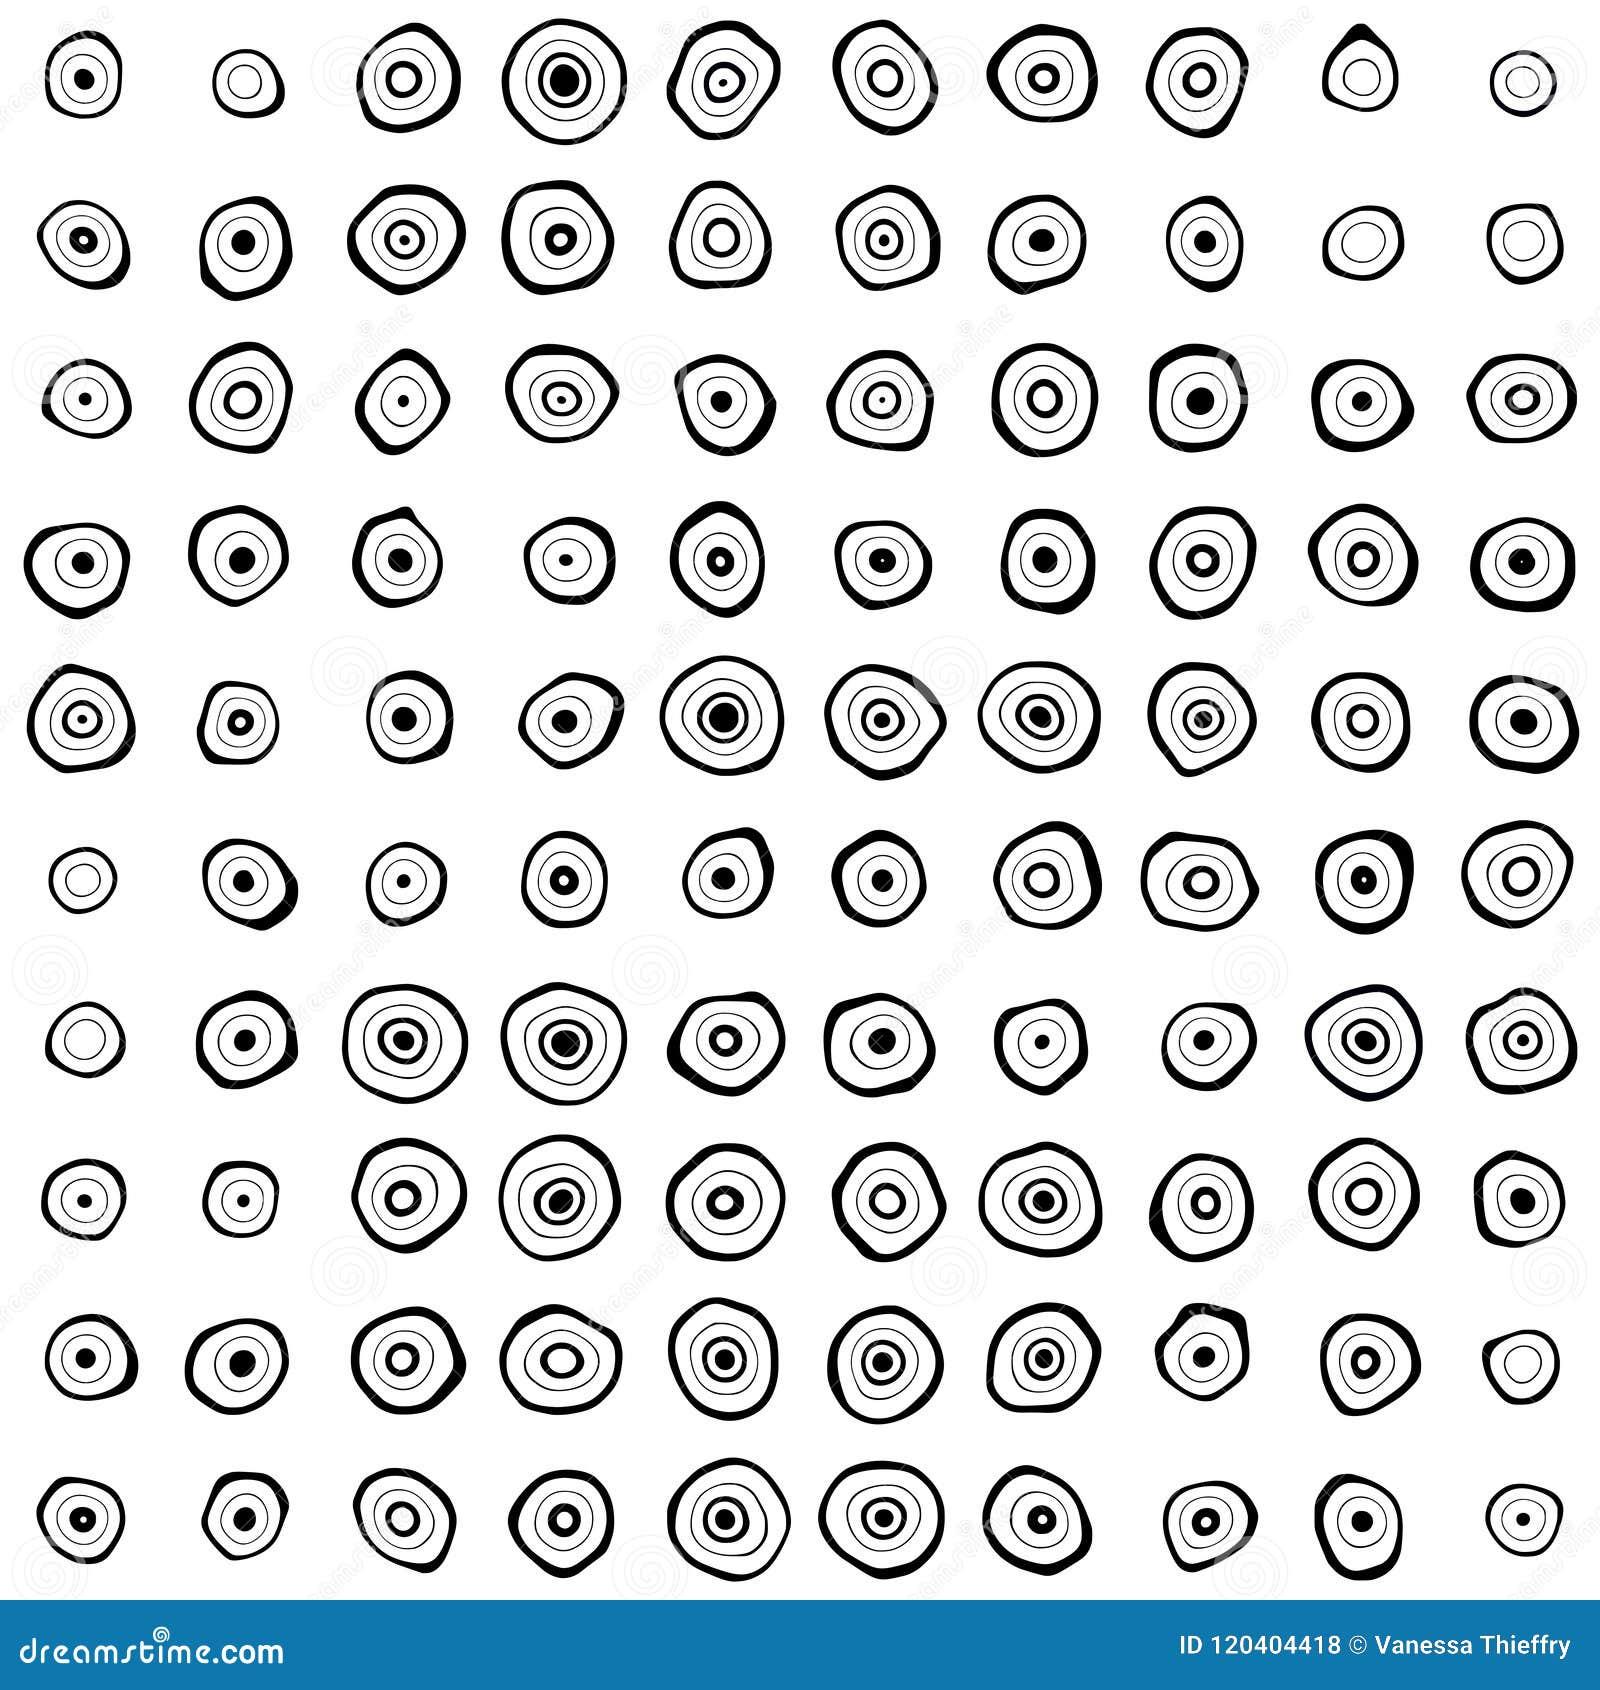 Black Concentric Irregular Circles Pattern Stock Photo Illustration Of Rings Backdrop 120404418